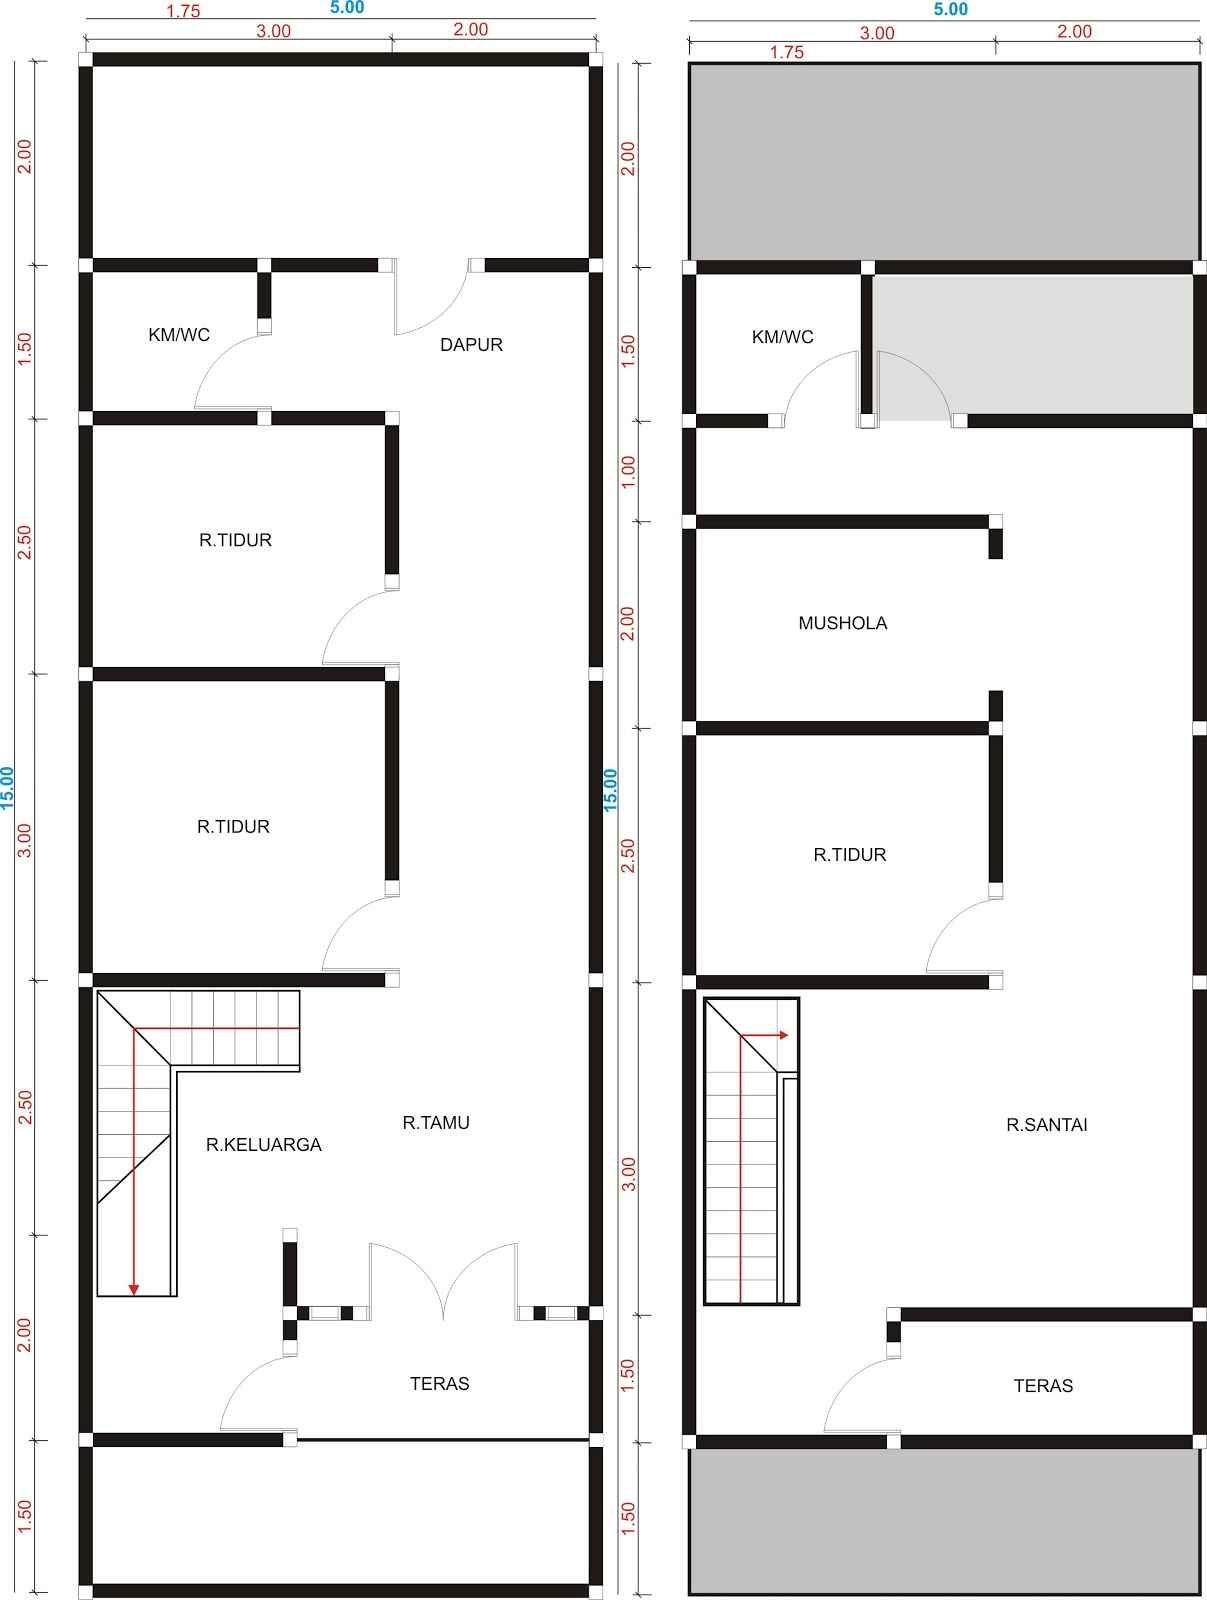 Desain Rumah Memanjang : desain, rumah, memanjang, Desain, Rumah, Minimalis, Memanjang, Belakang, Minimalis,